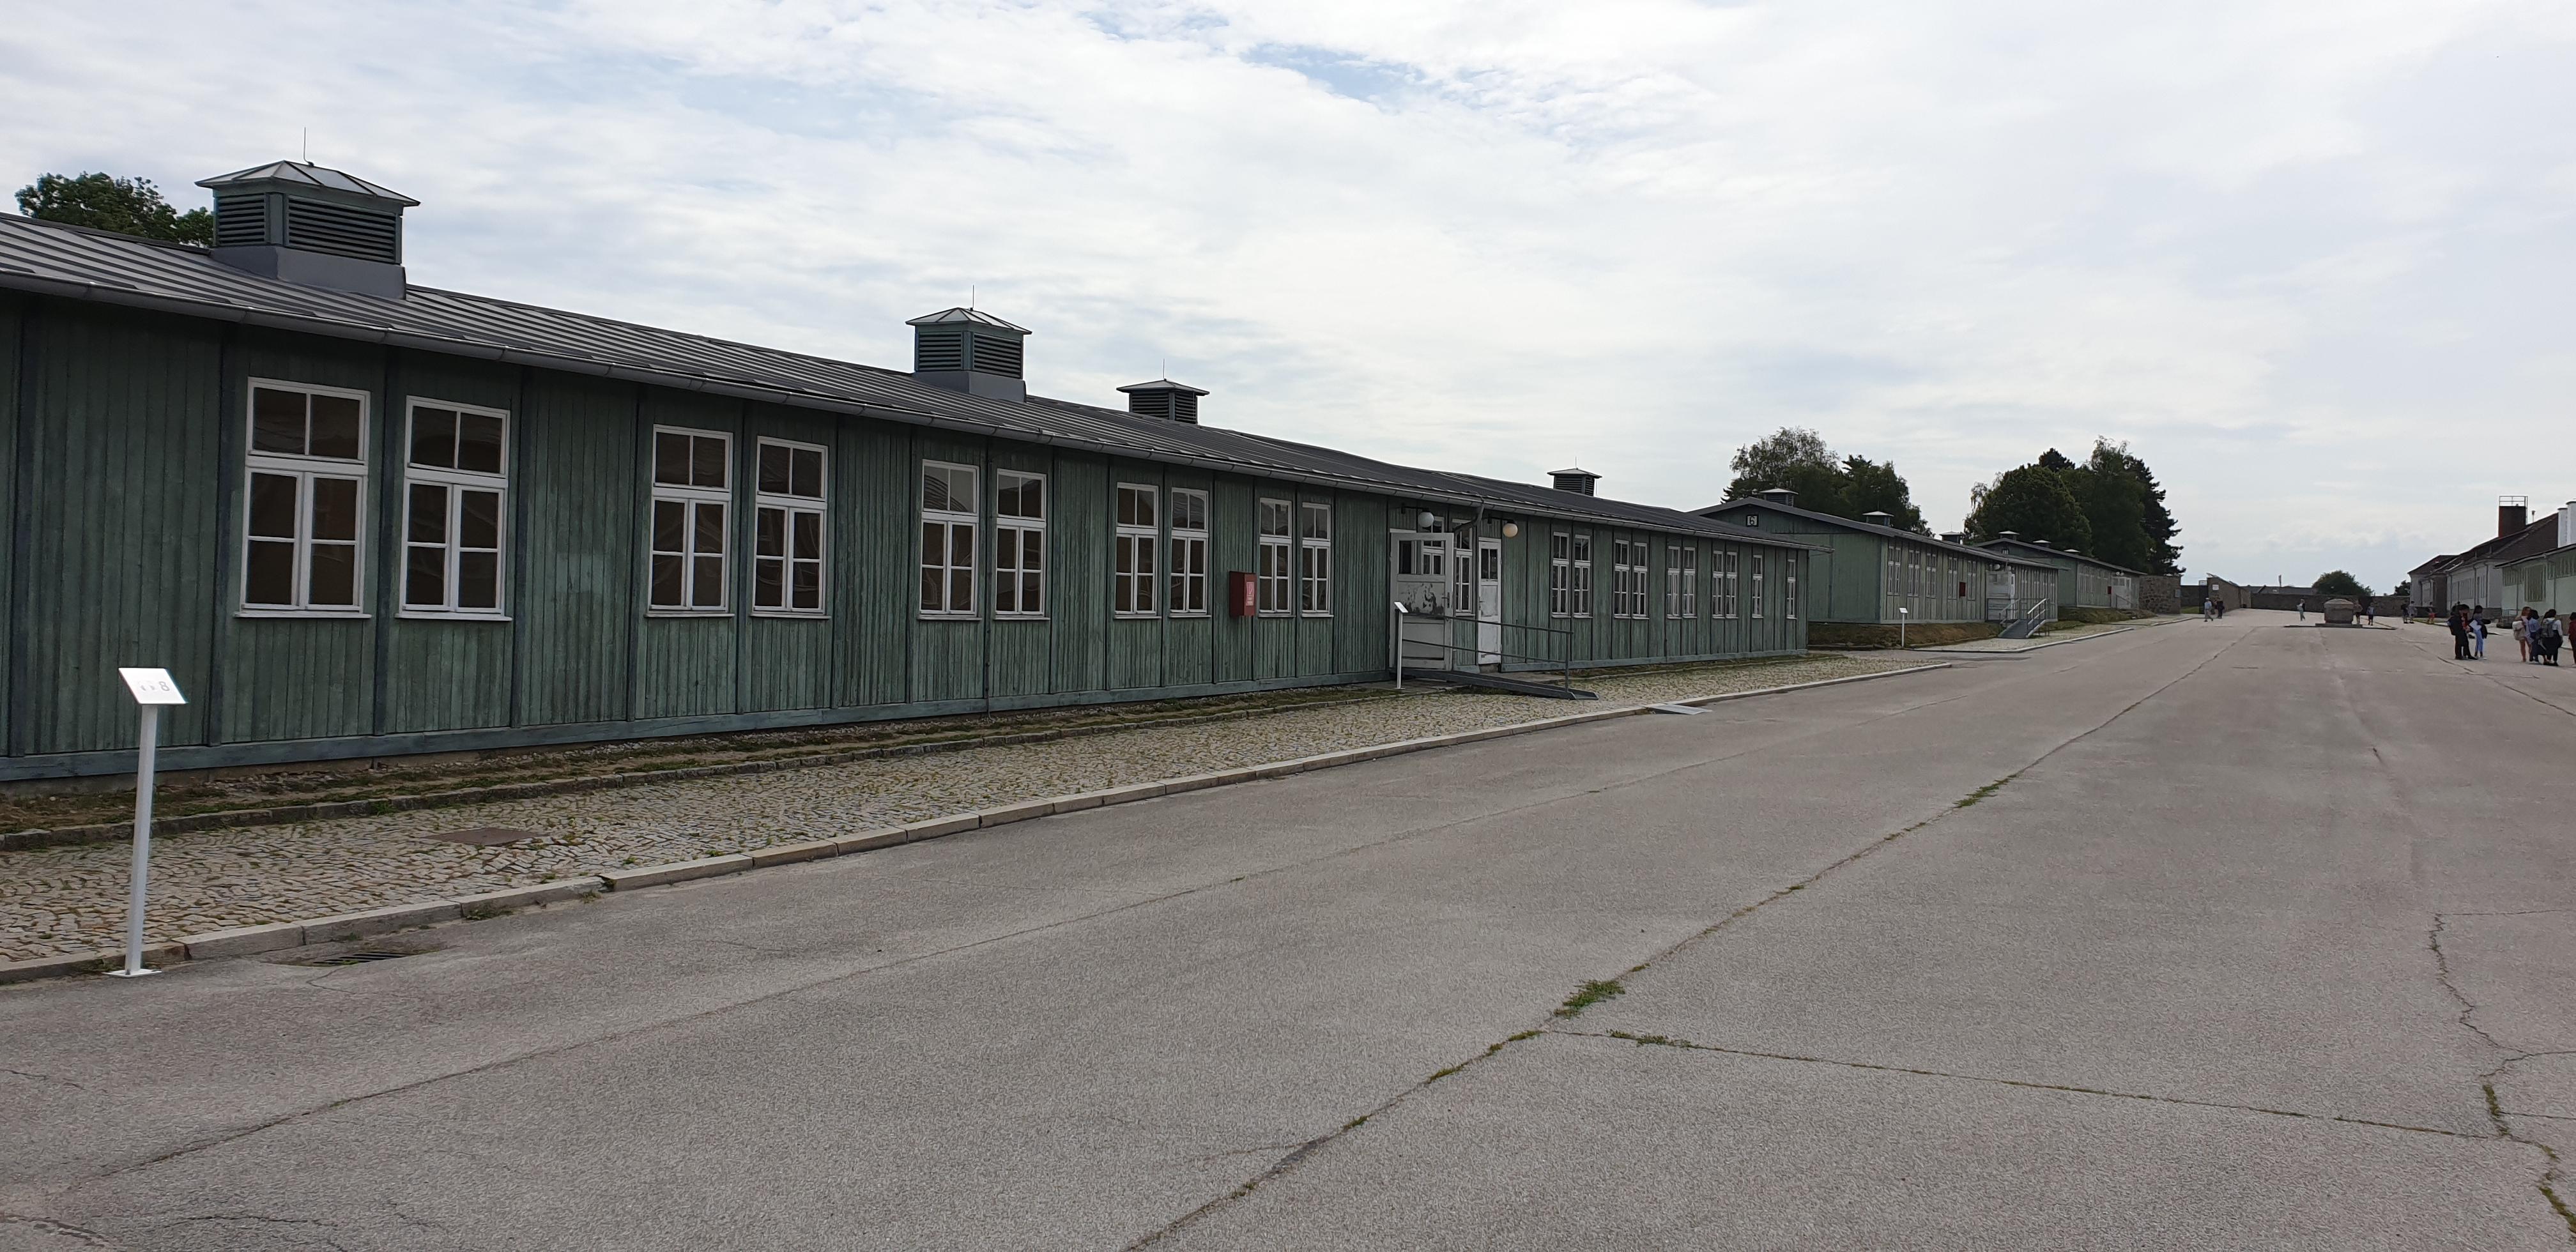 Mauthausen Concentration Camp www.chasingemma.com